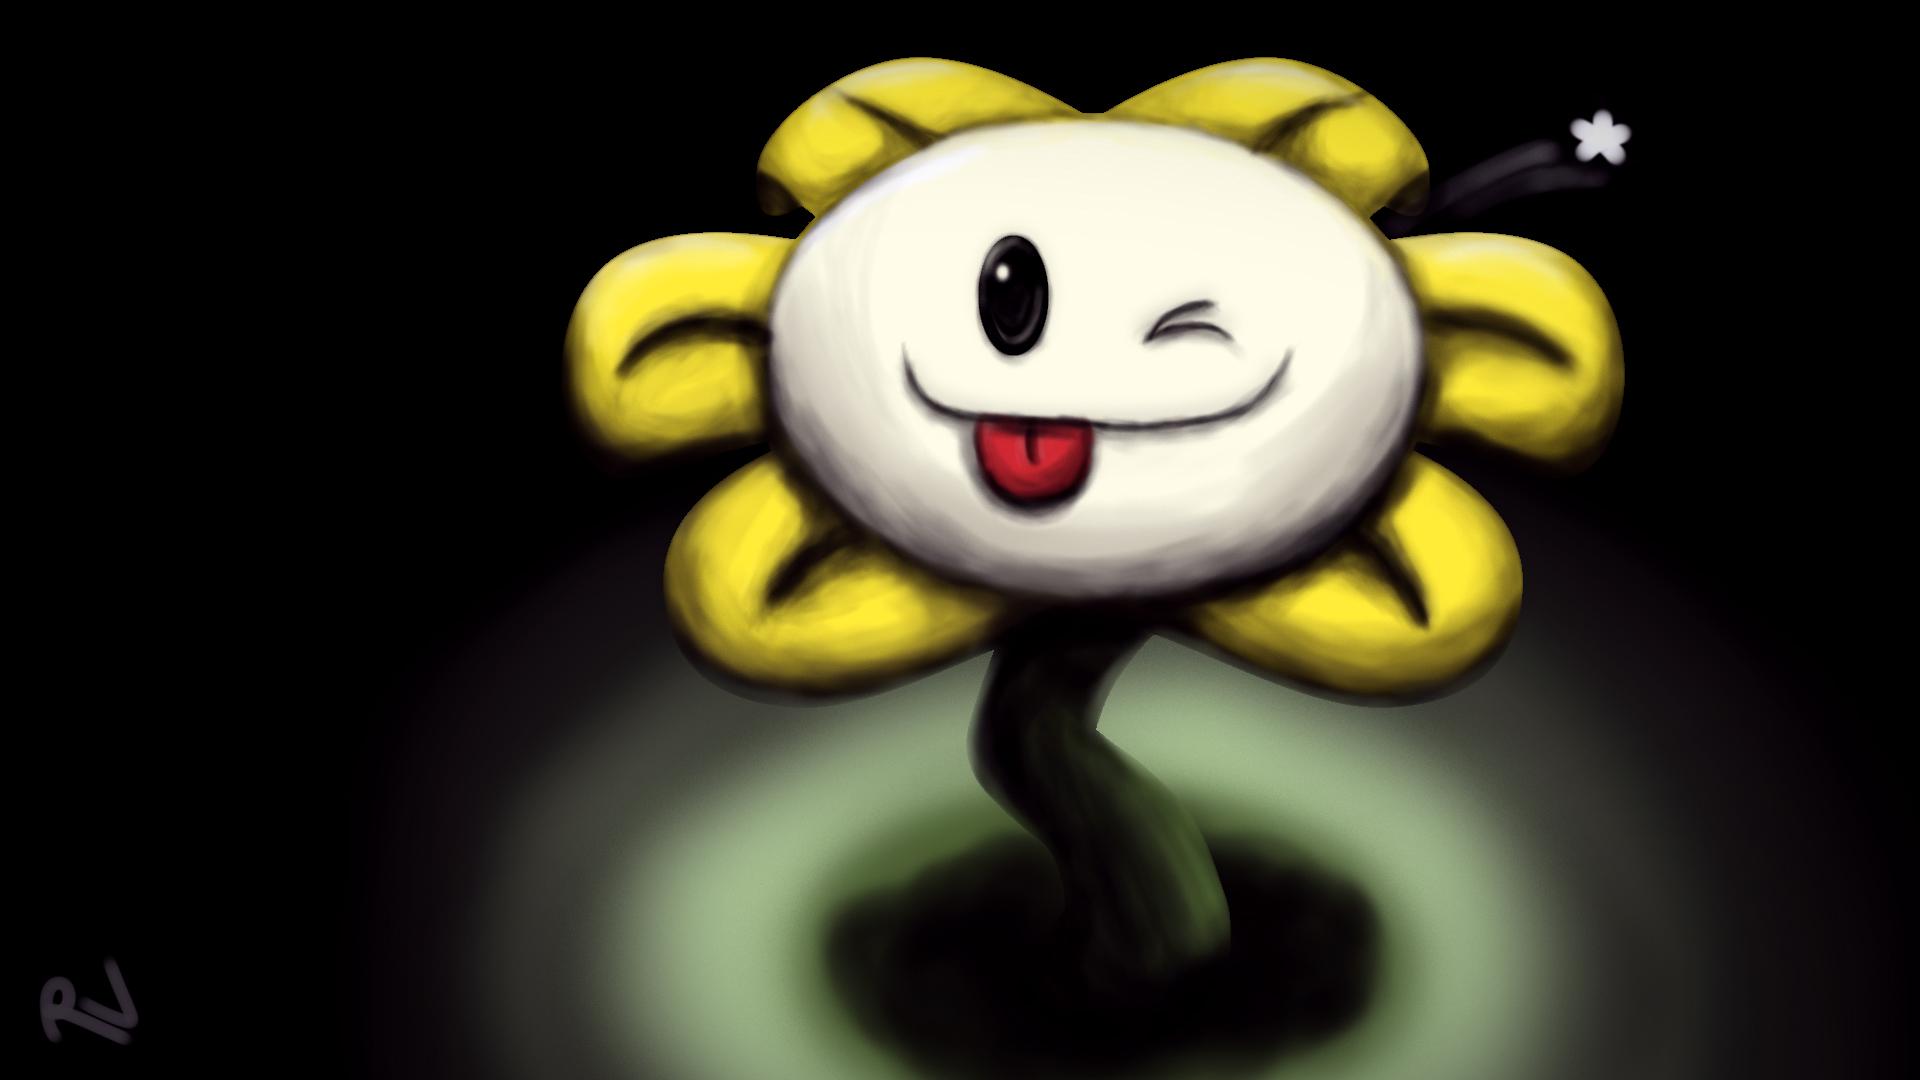 Flowey The Flower by TacoMakerMan on DeviantArt